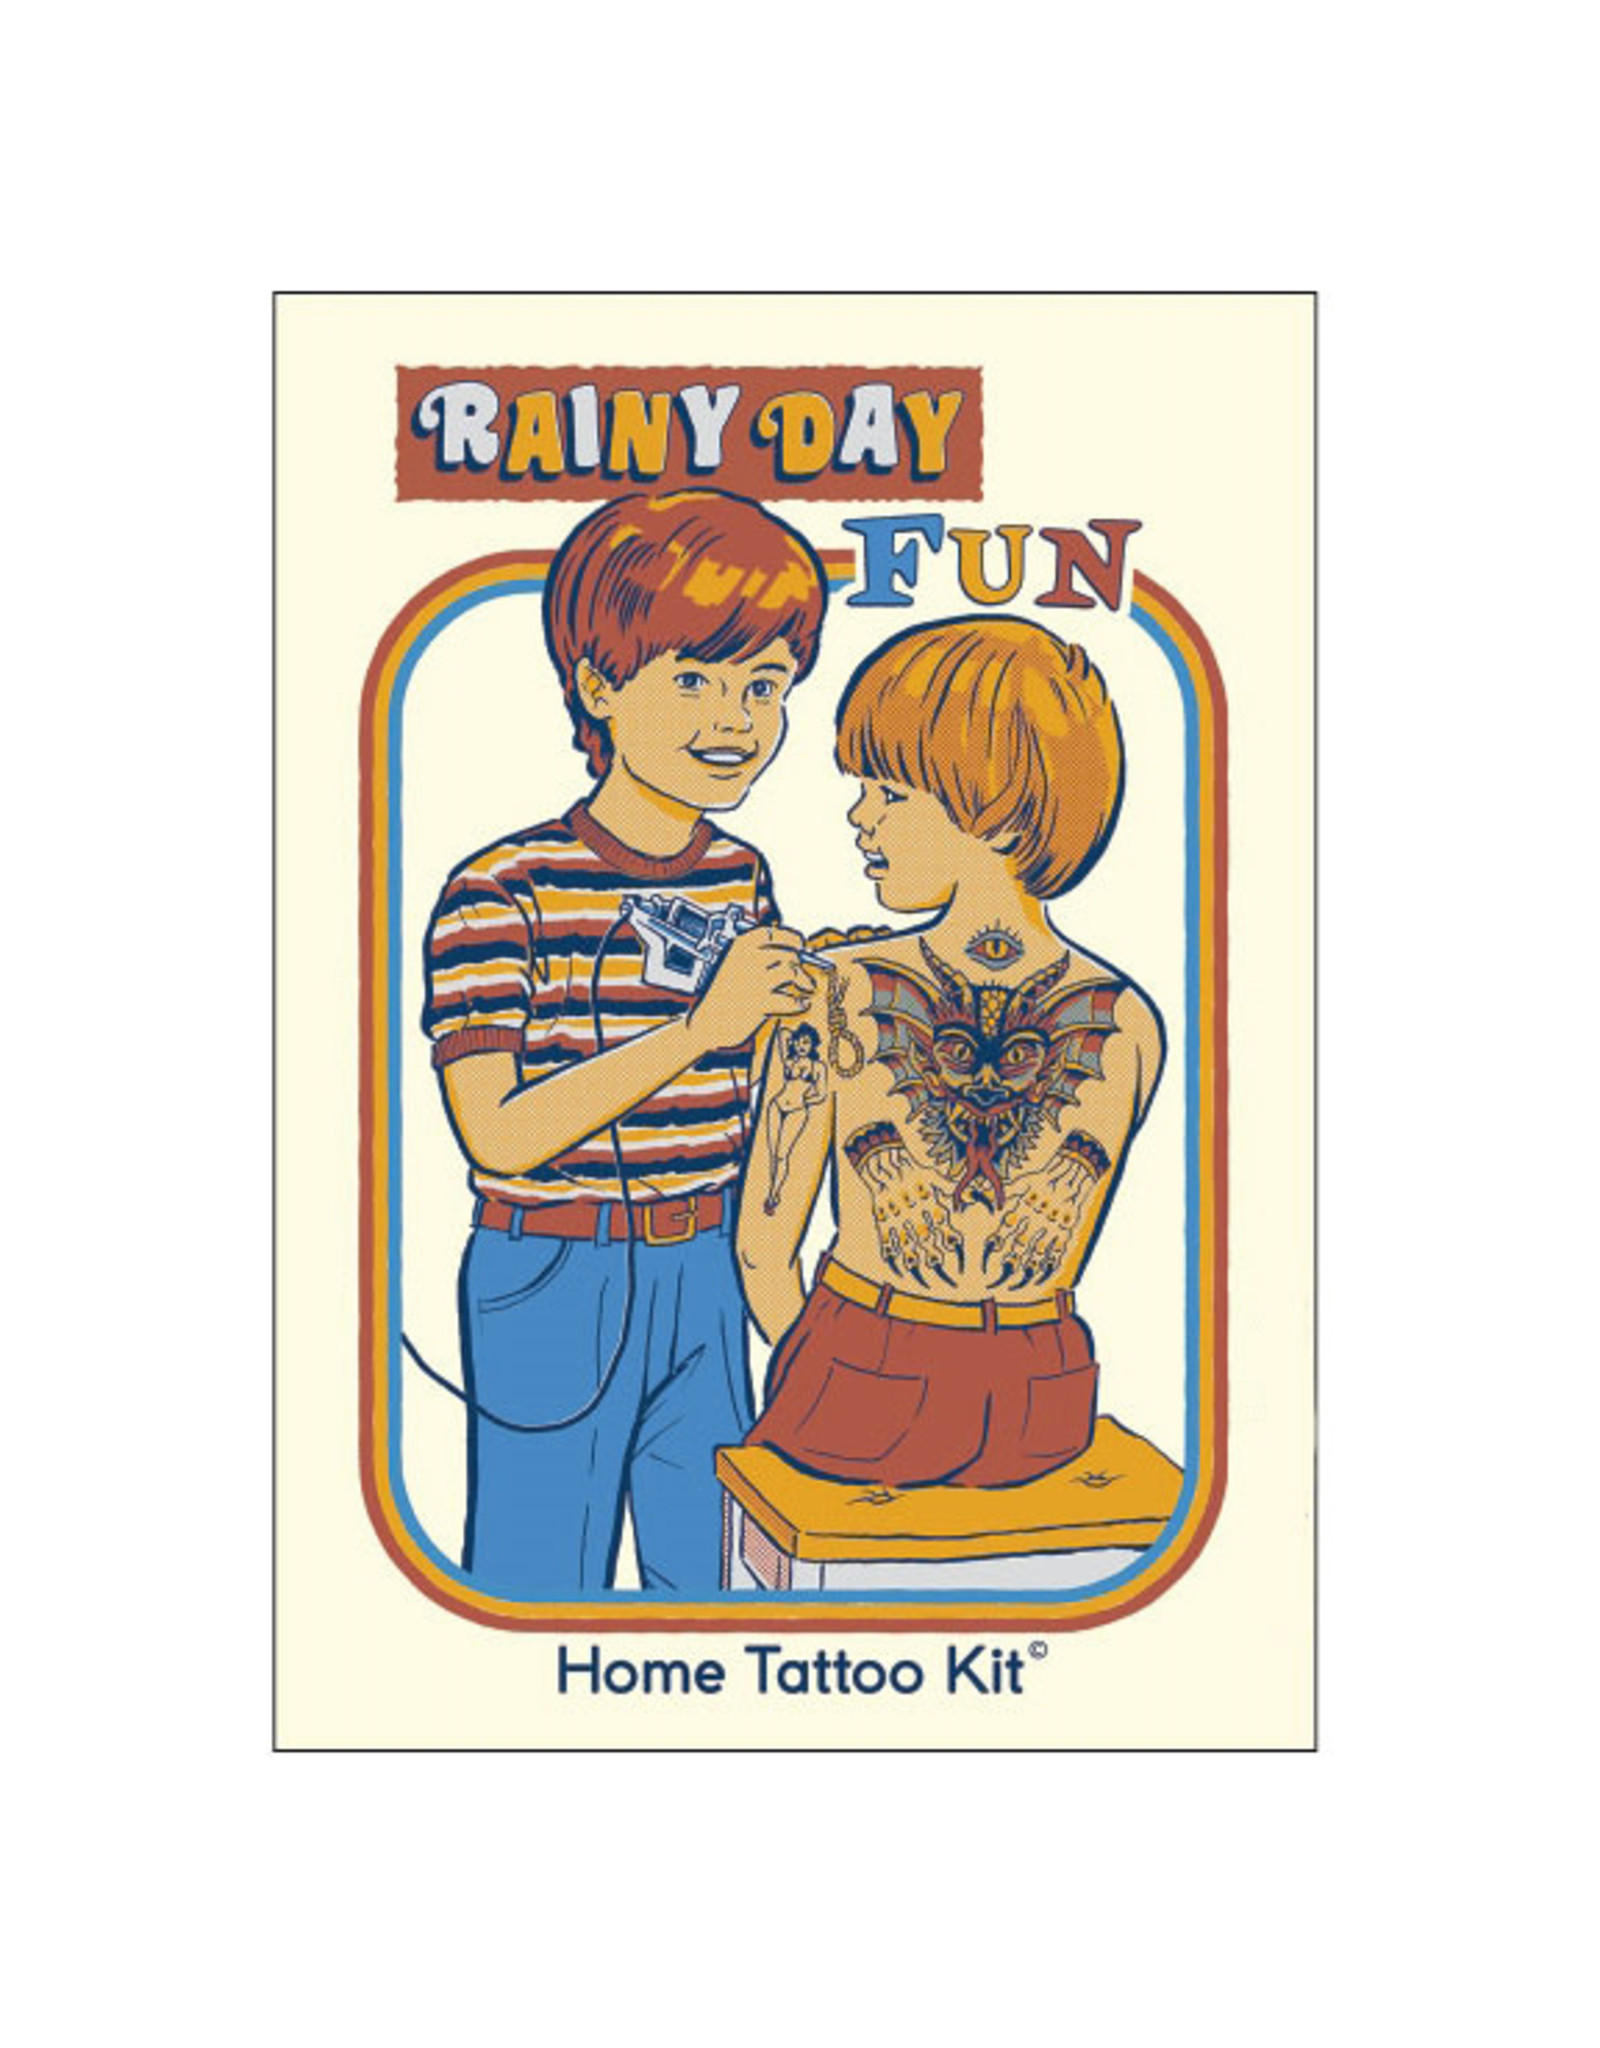 Rainy Day Fun Home Tattoo Kit Magnet